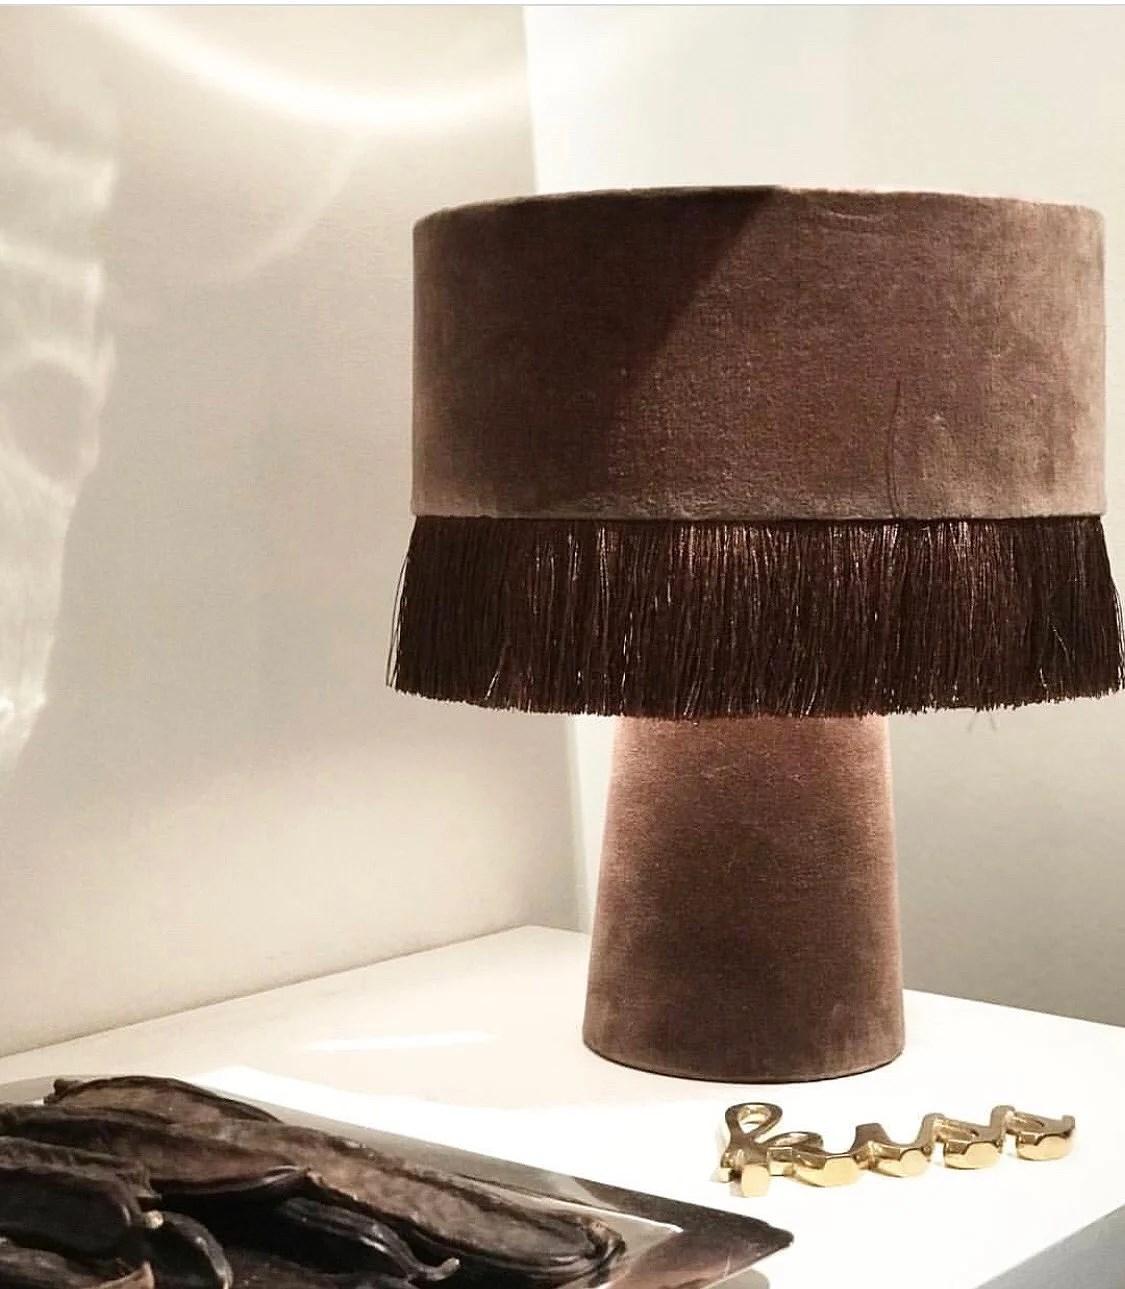 Lampa i sammet